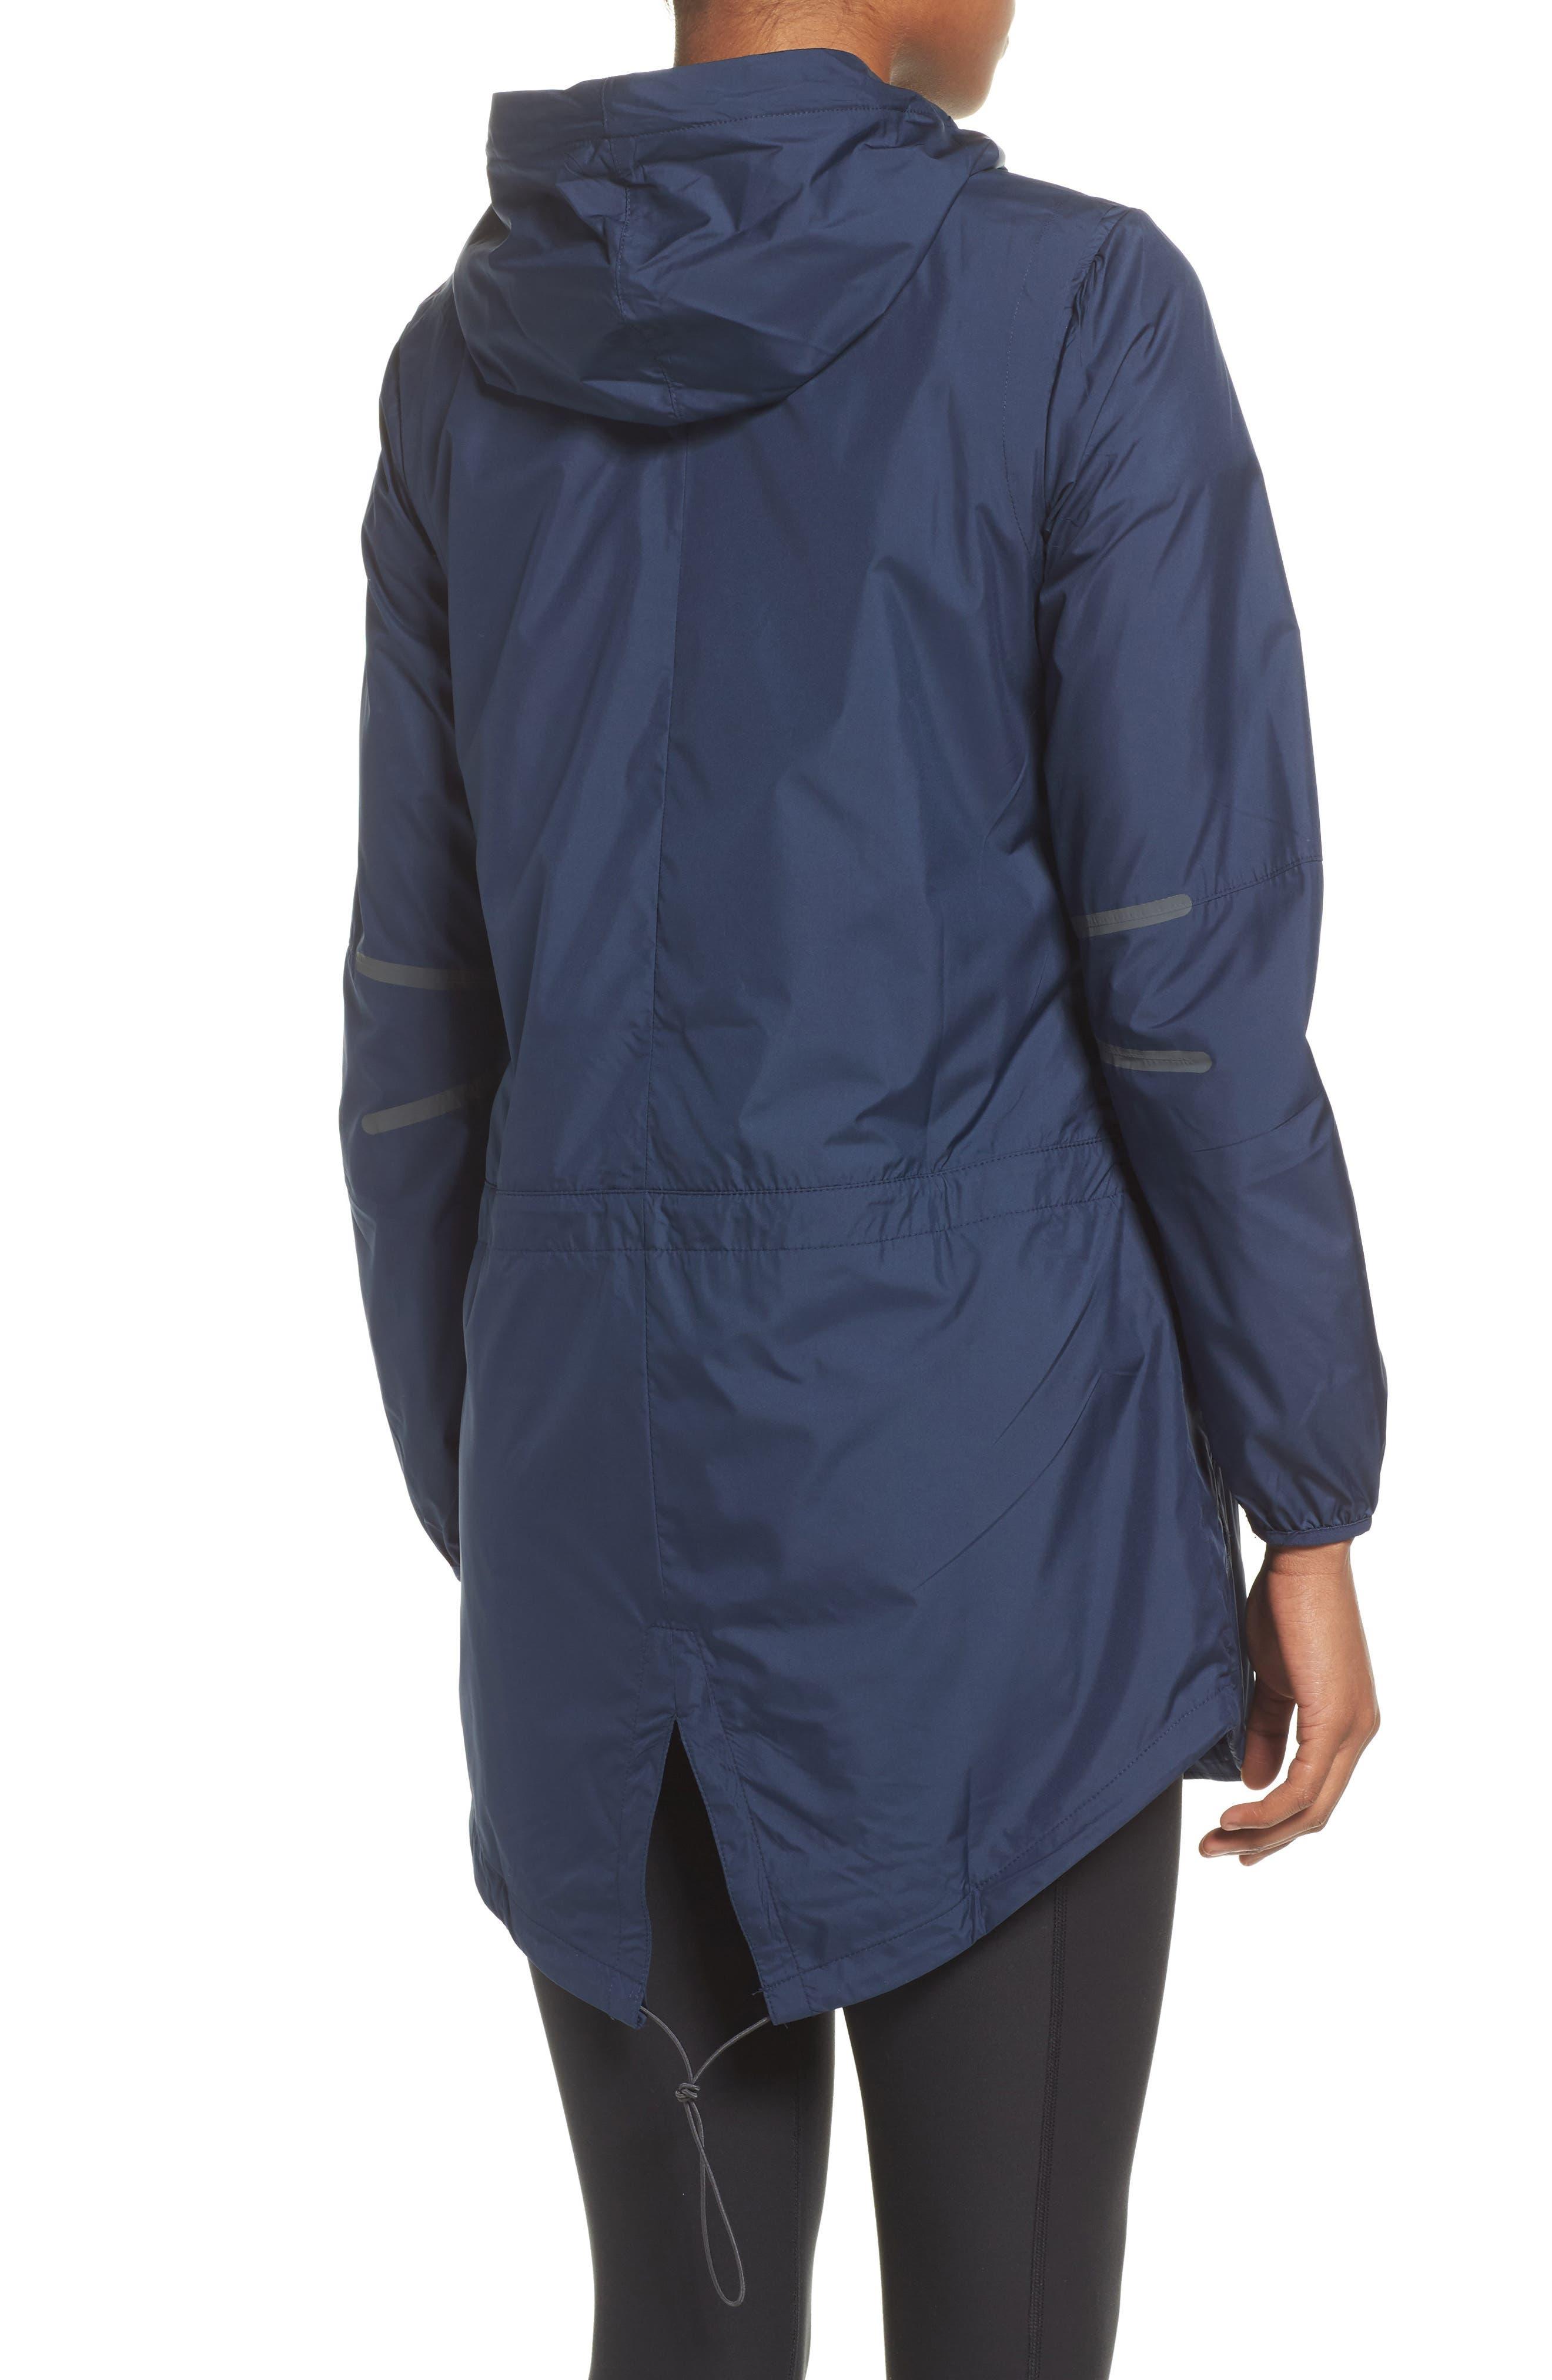 NFL Packable Water Resistant Jacket,                             Alternate thumbnail 3, color,                             College Navy/ Seahawks